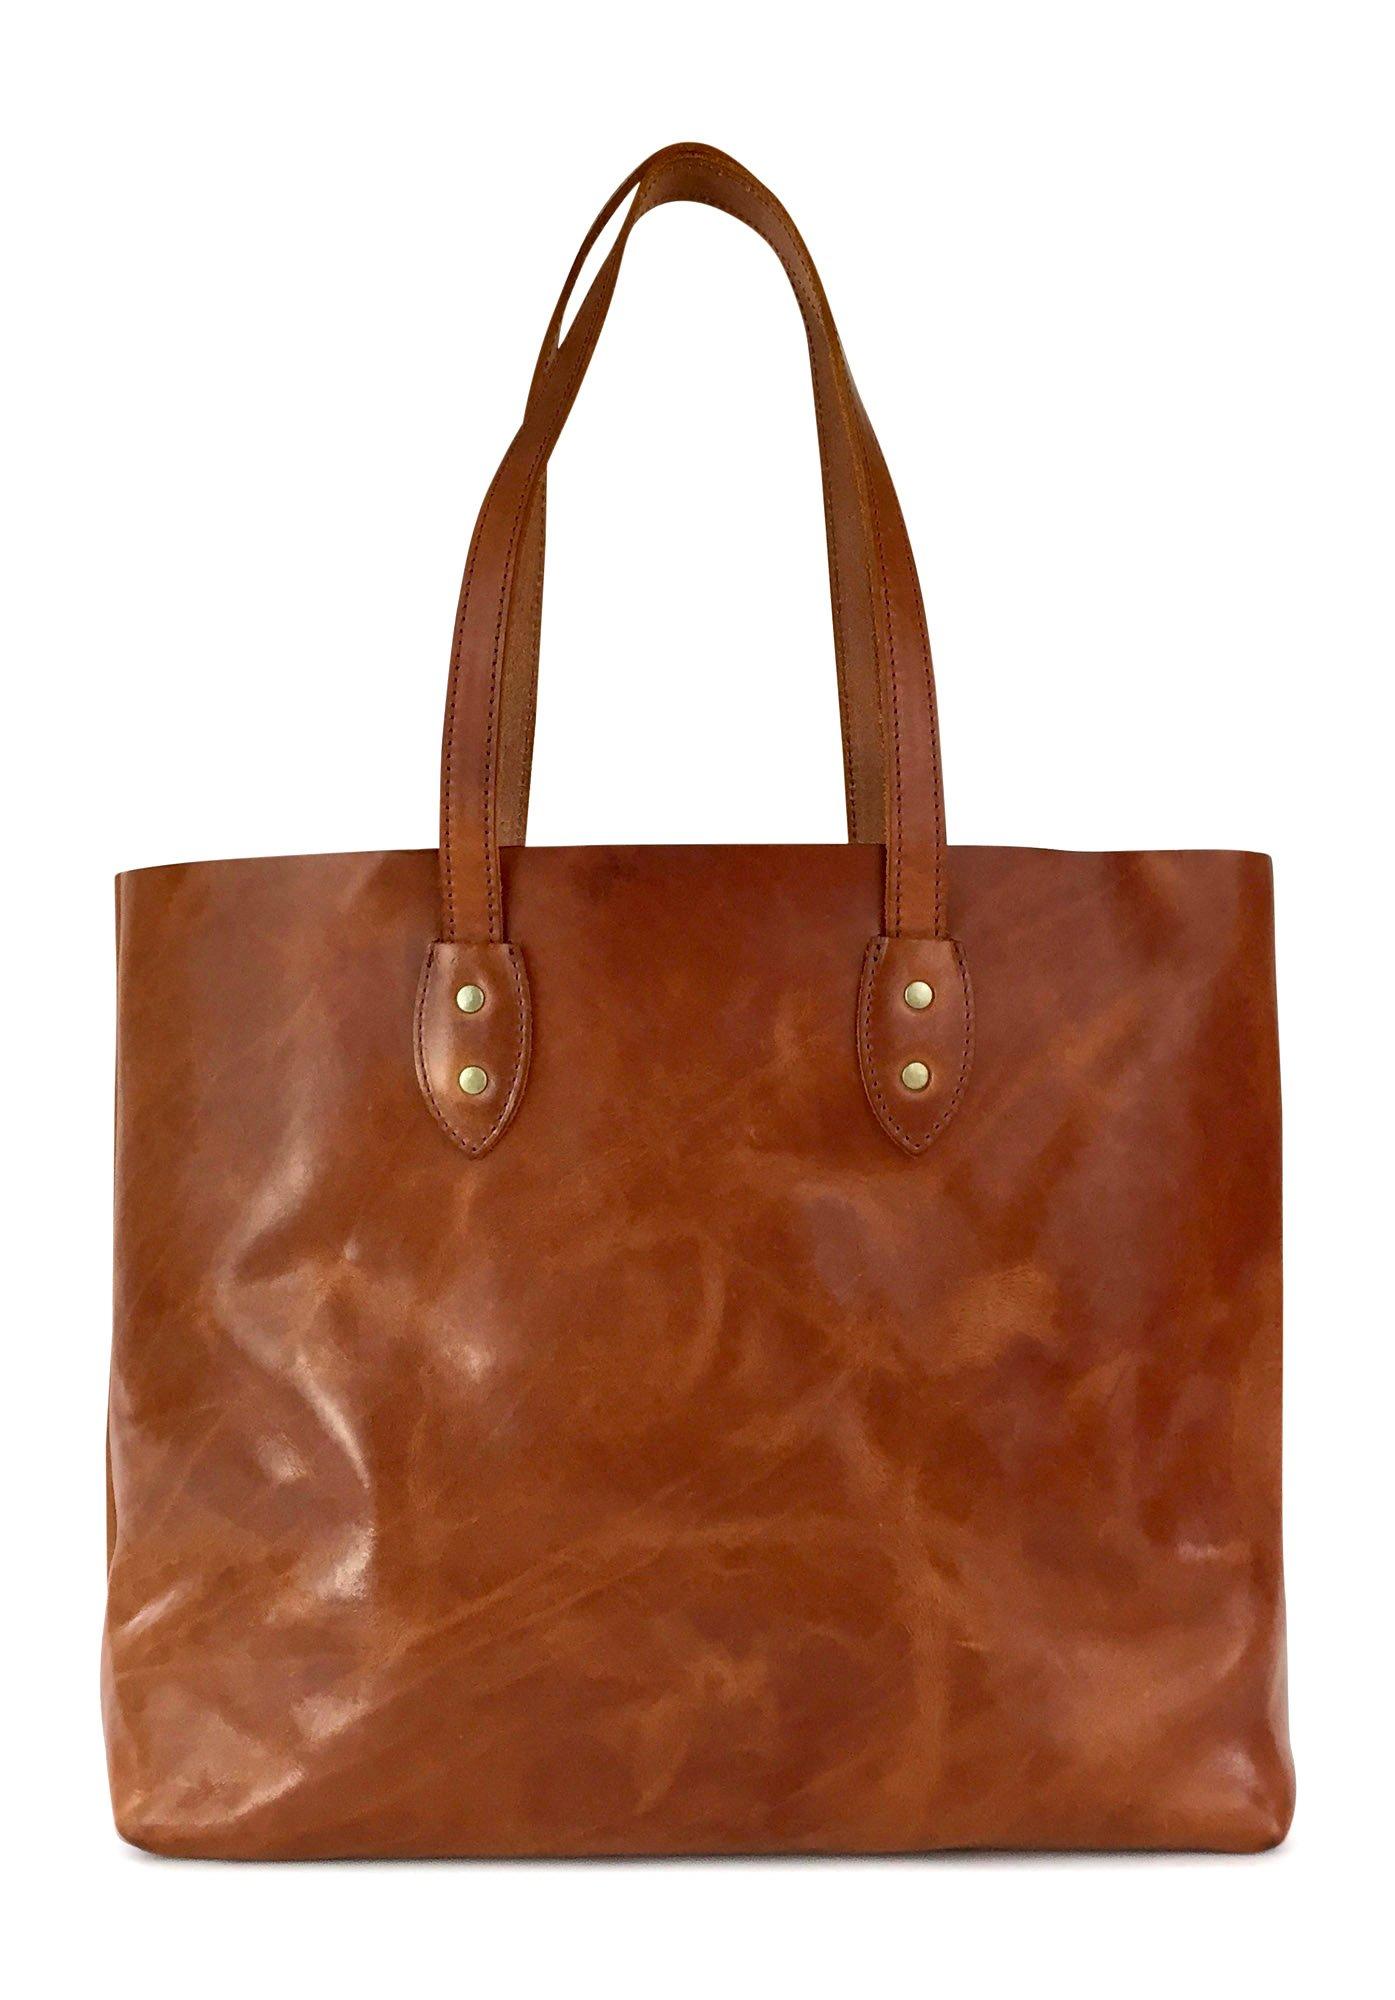 Vintage Leather Tote Bag by Jackson Wayne (Saddle Tan)